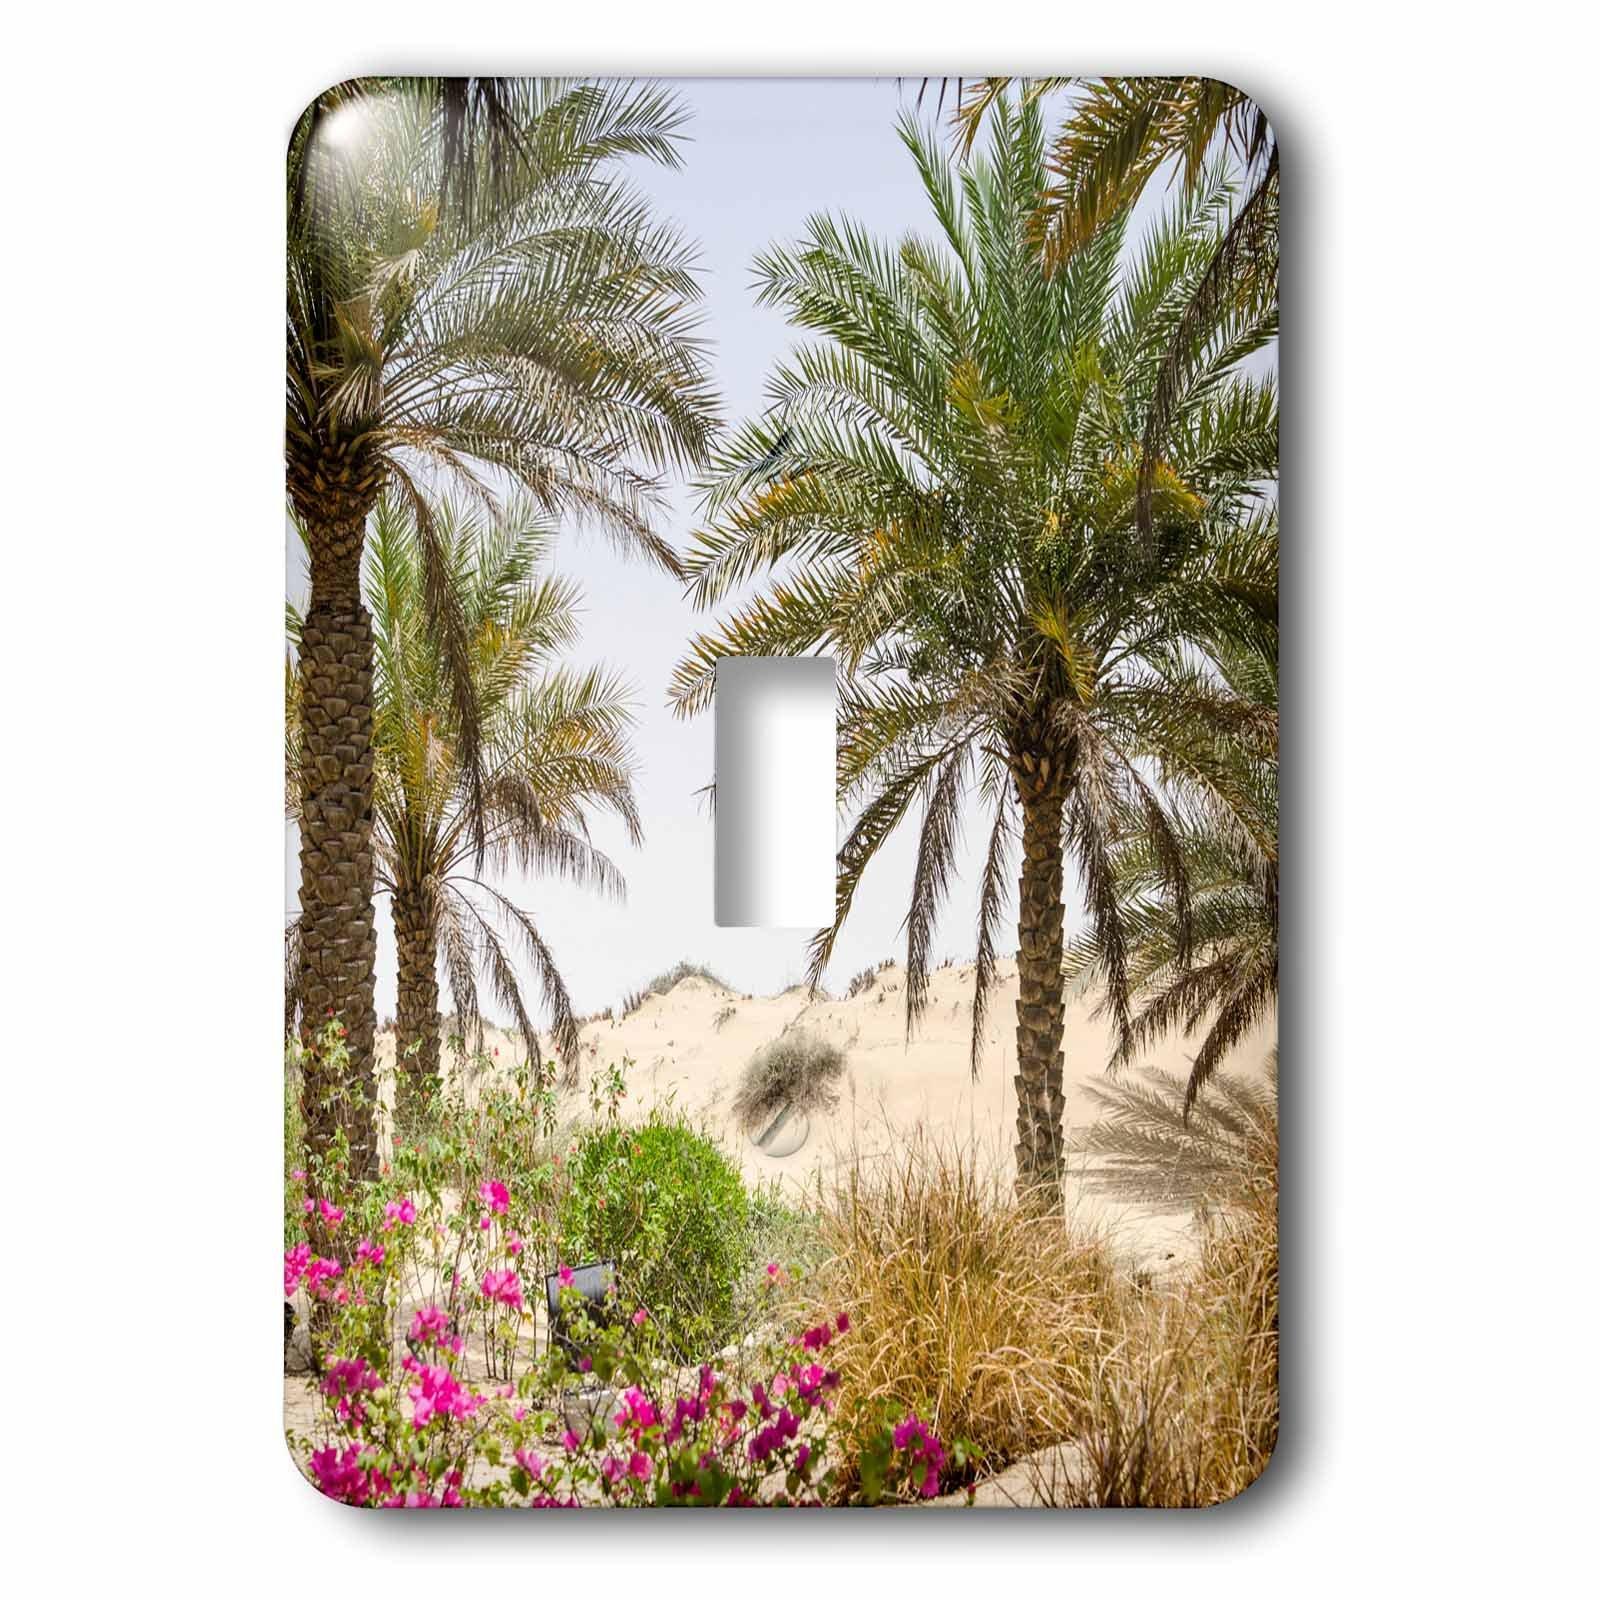 3dRose lsp_226128_1 Resort and Spa. Dubai Single Toggle Switch